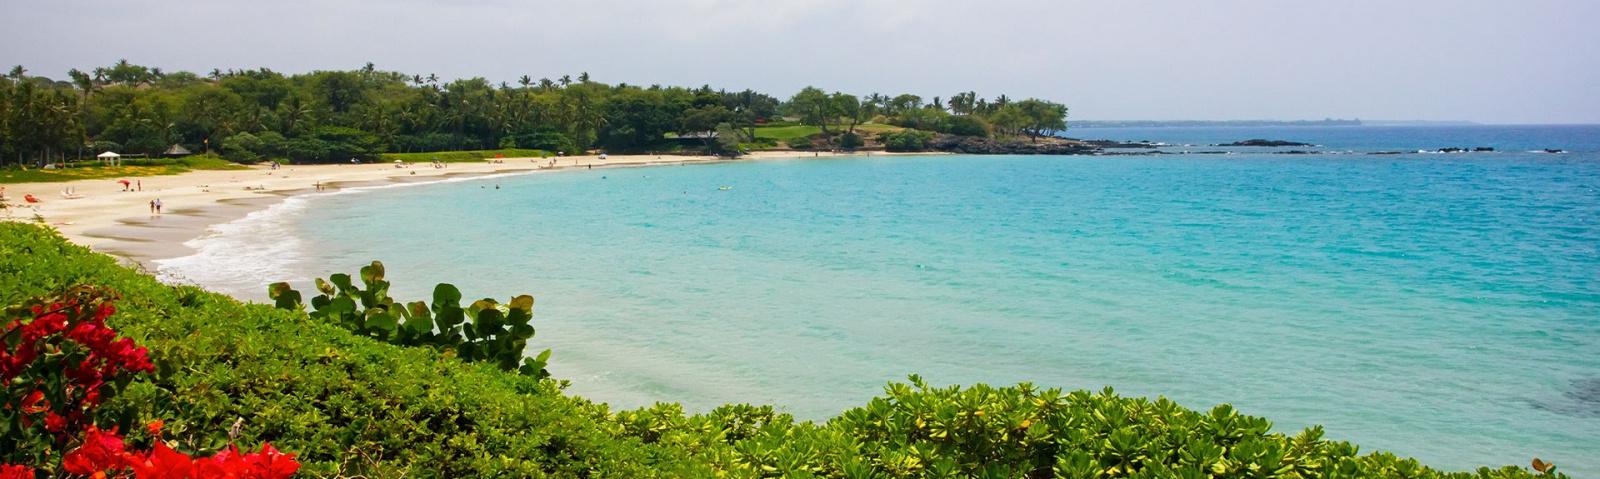 Hapuna Beach State Park Island Hawaii